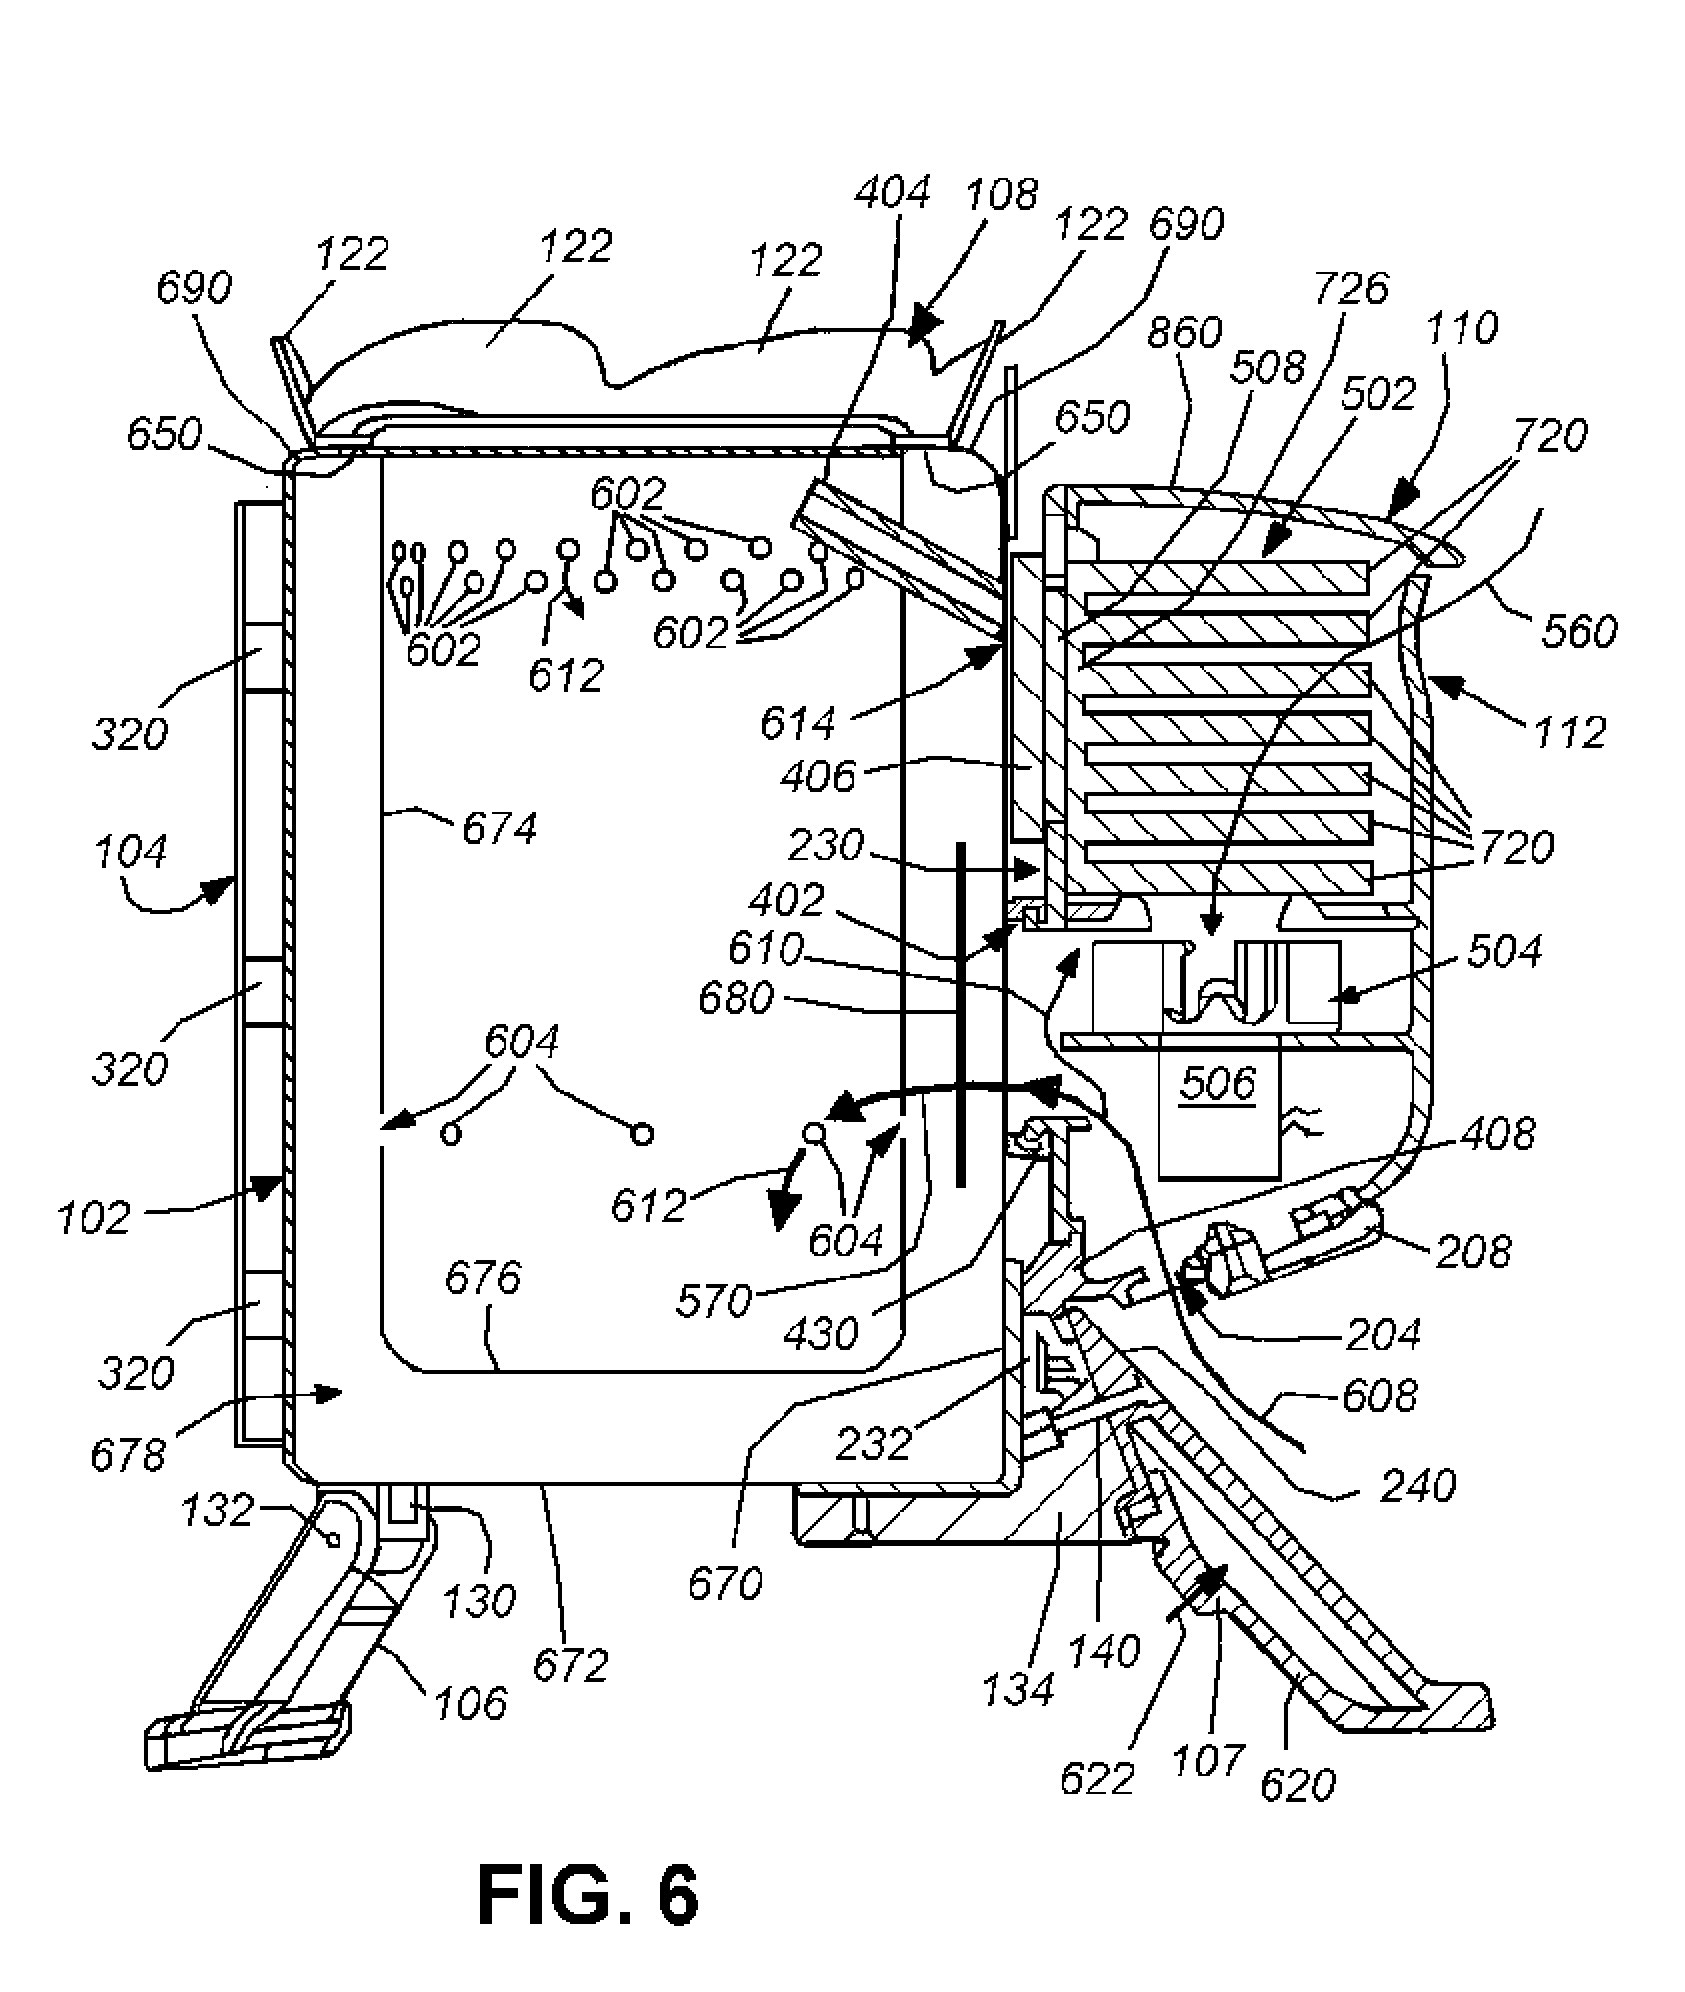 Charming 1995 Honda Crv Fuse Lamp Wiring Diagram Two Sockets 2000 94 F250 Under Hood Box 99 Civic Gallery Design Ideas Us20130112187a1 20130509 D00006 Diagramhtml